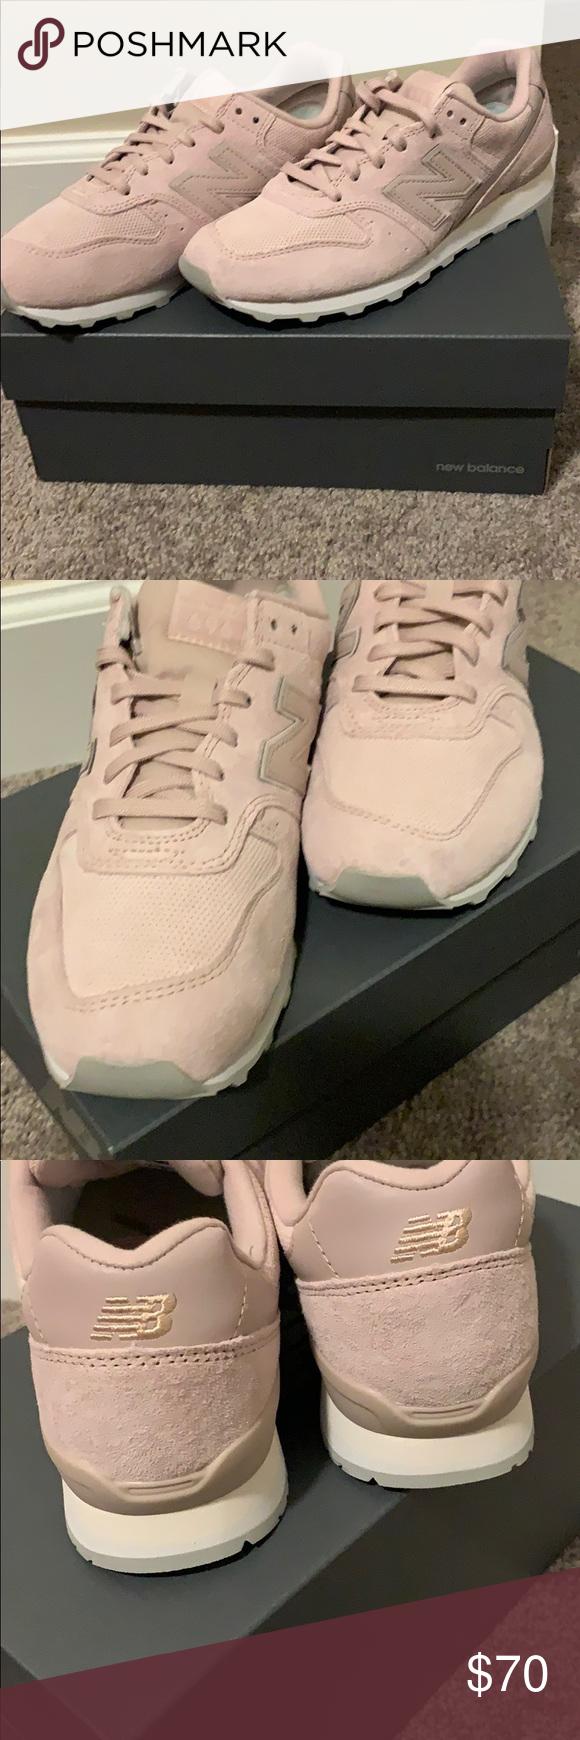 new balance pink sand